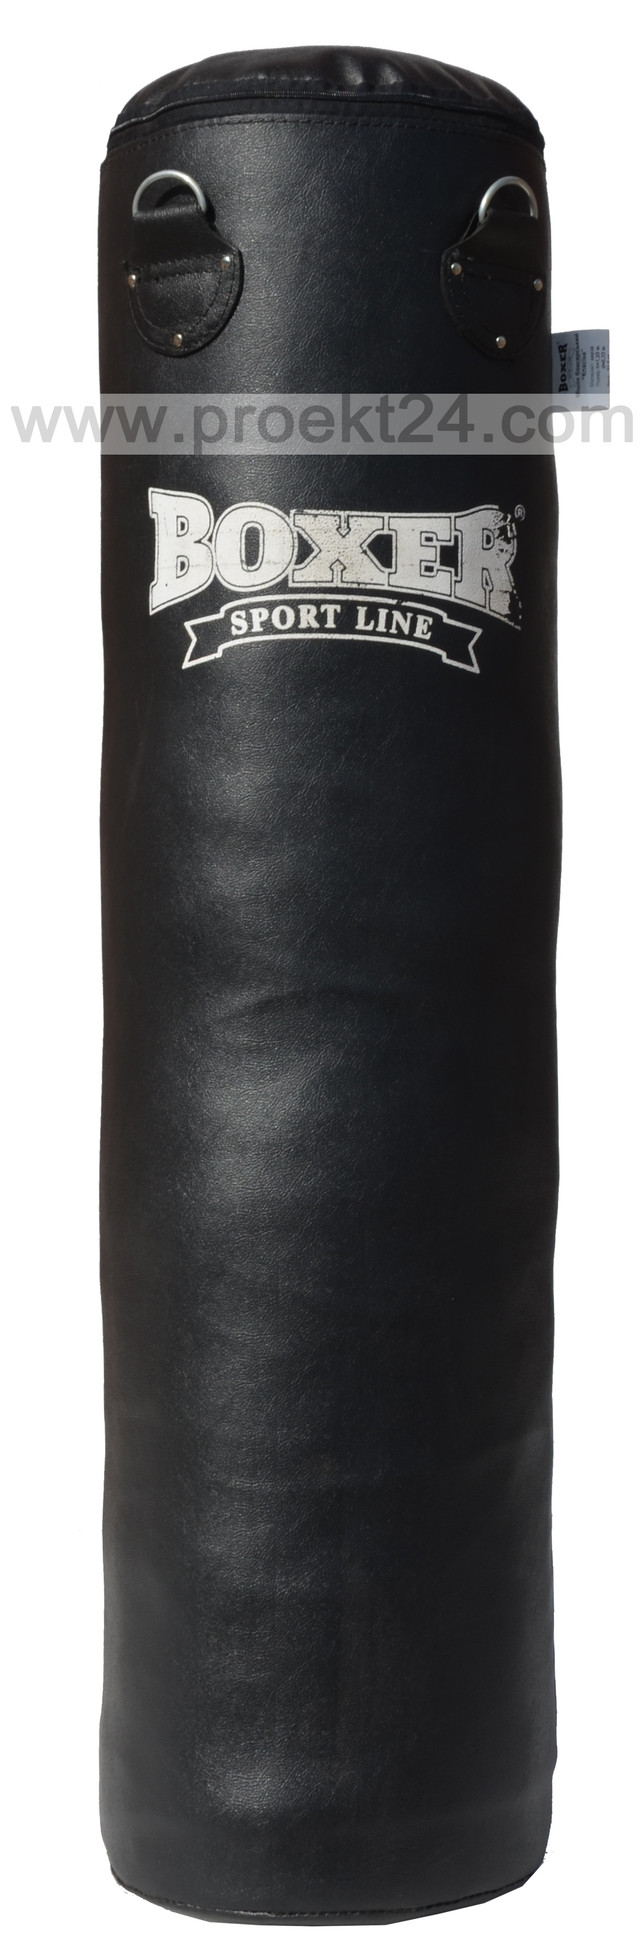 боксерская груша, боксерская груша купить, боксерская груша цена